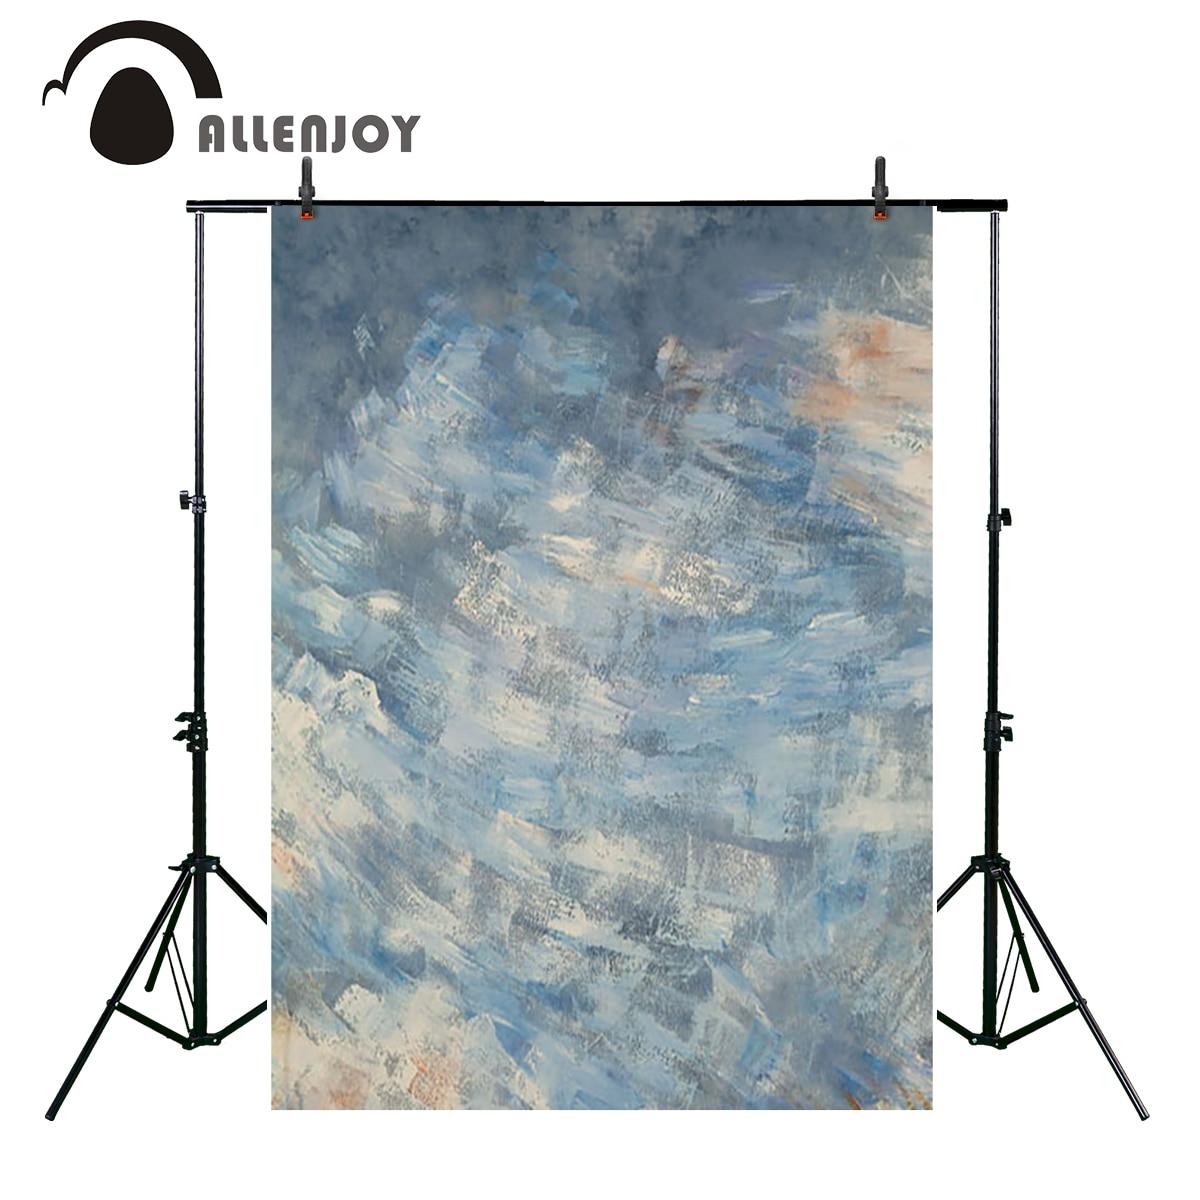 Allenjoy pastel blue blended texture photography backgrounds abstract Computer Print portrait baby shower backdrop photo studio smeg sjf01pbeu шнековая соковыжималка pastel blue